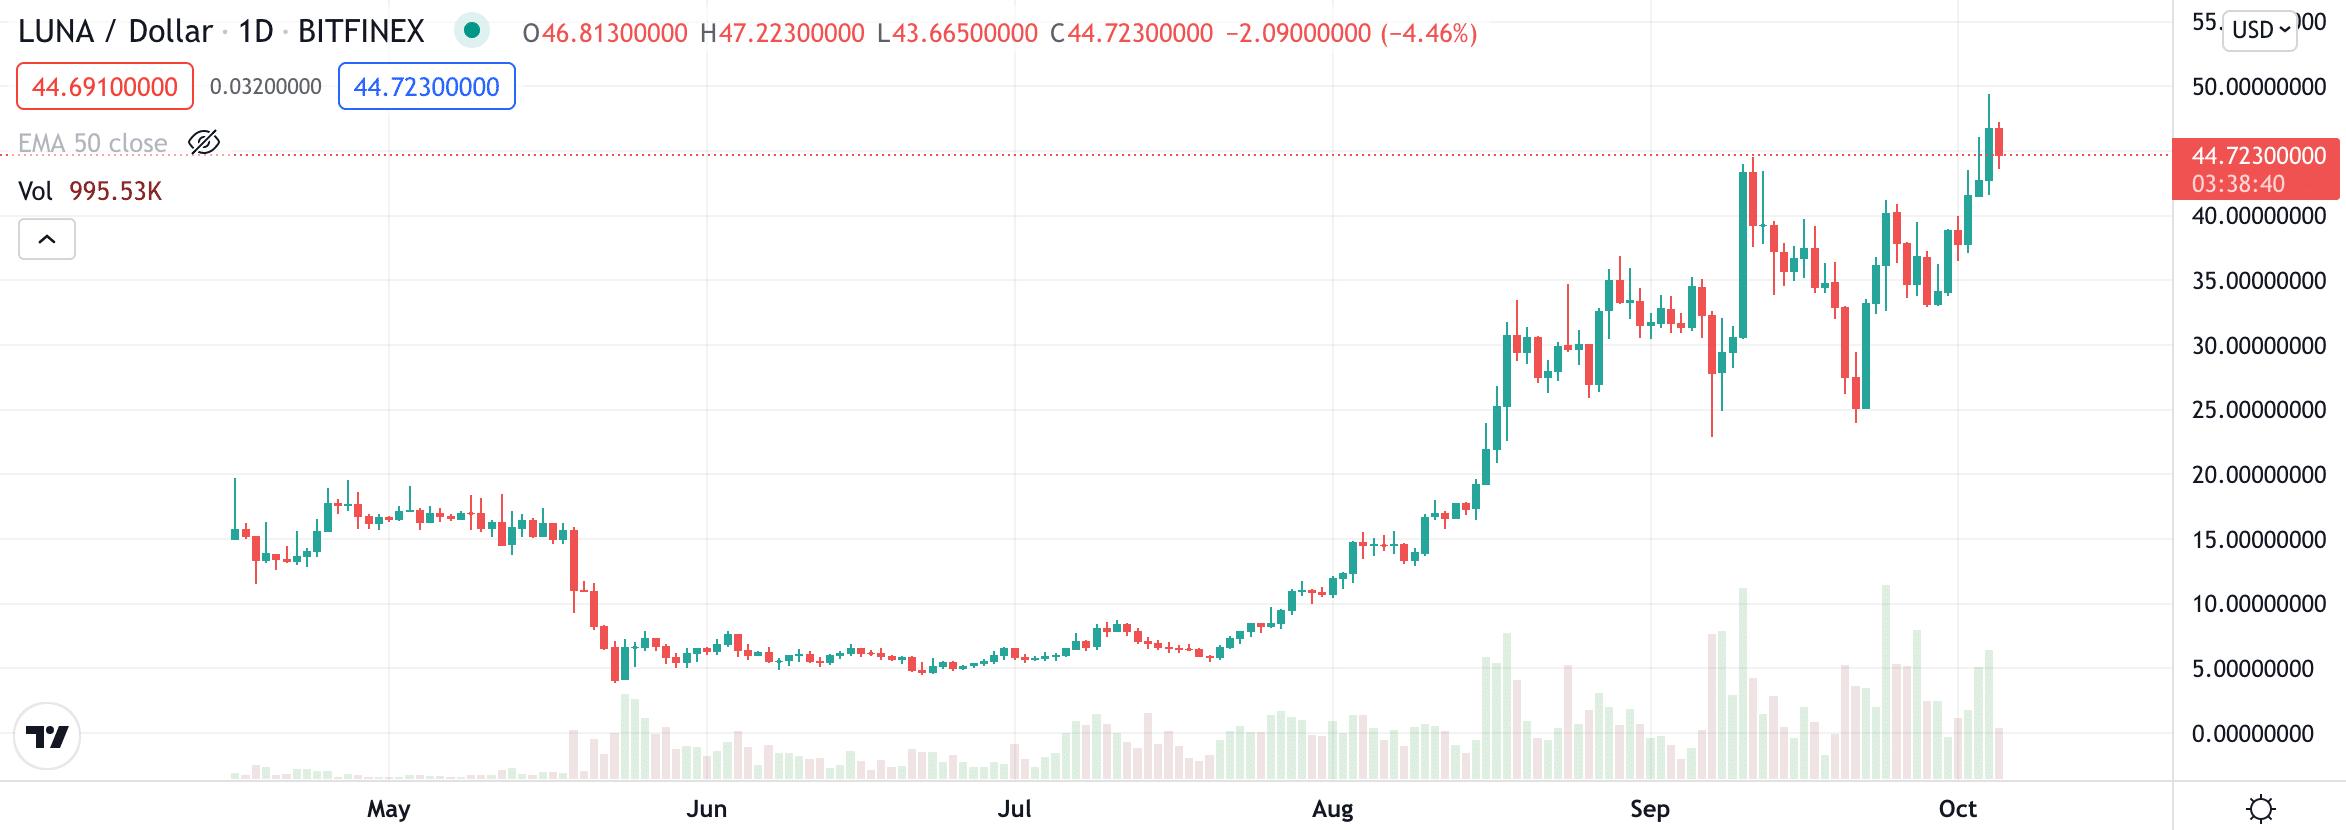 luna price chart